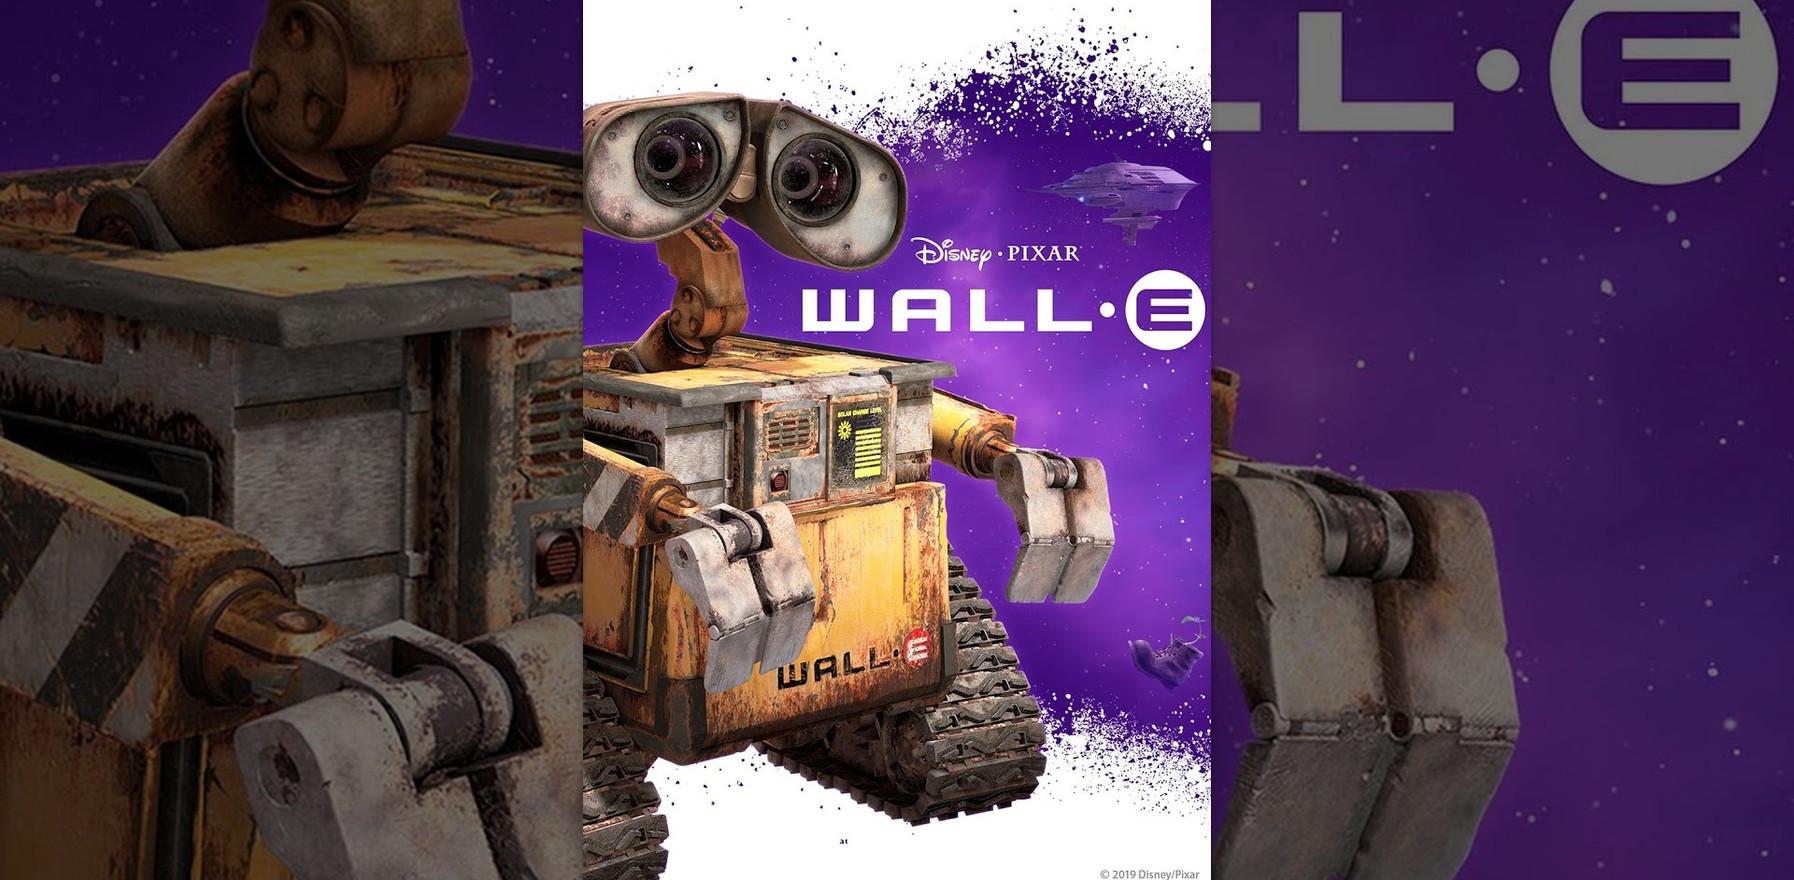 WALL-E (Where to watch)